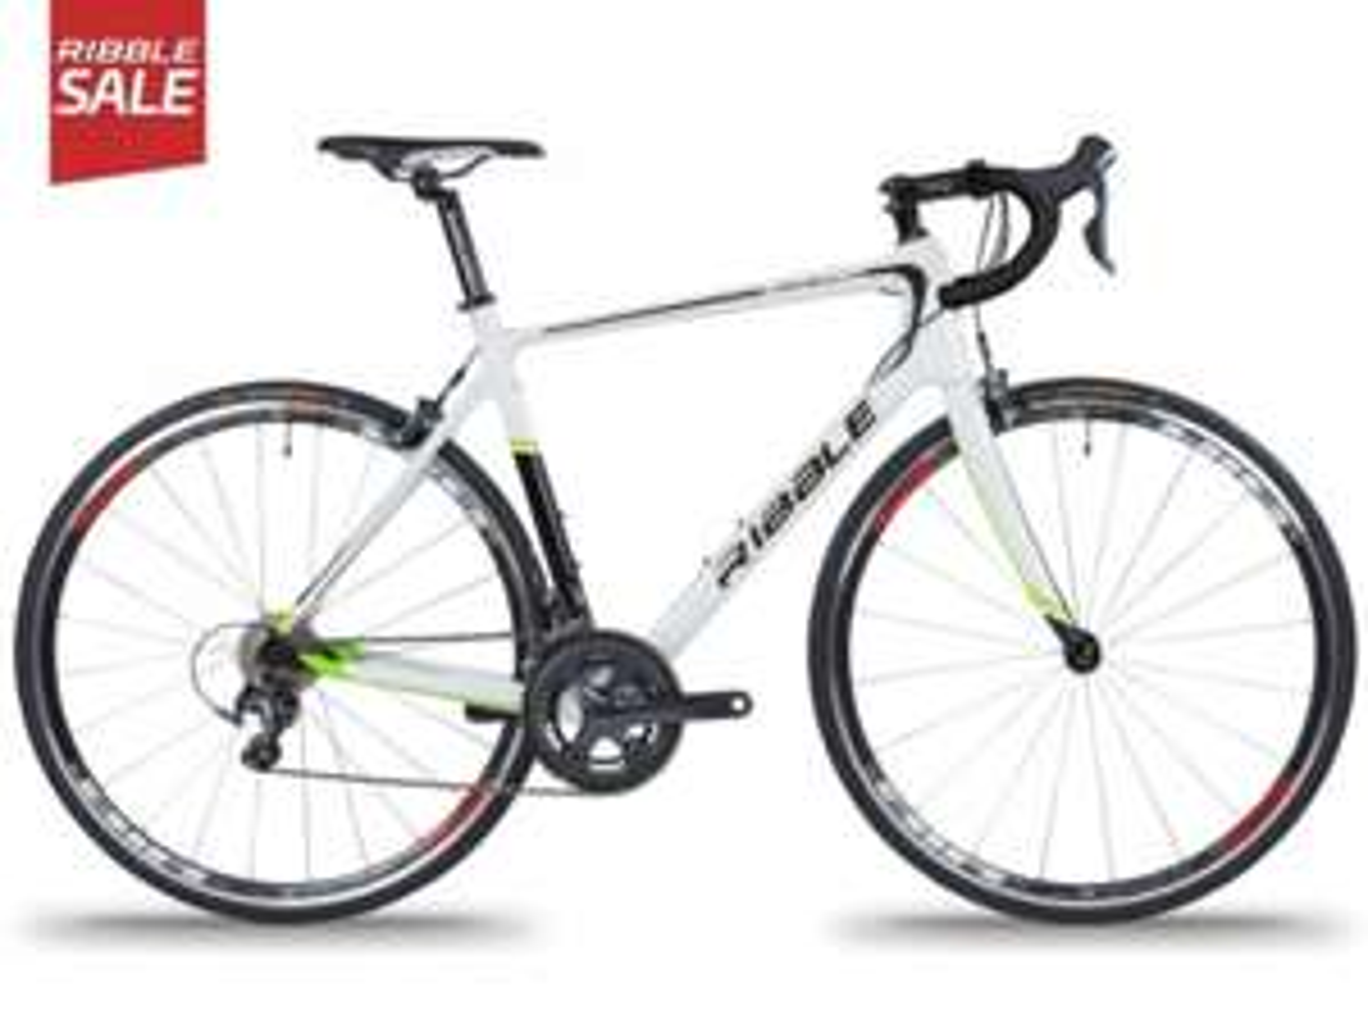 Ribble Evo Pro Tiagra Road Bike - full carbon Tiagra groupset for £749